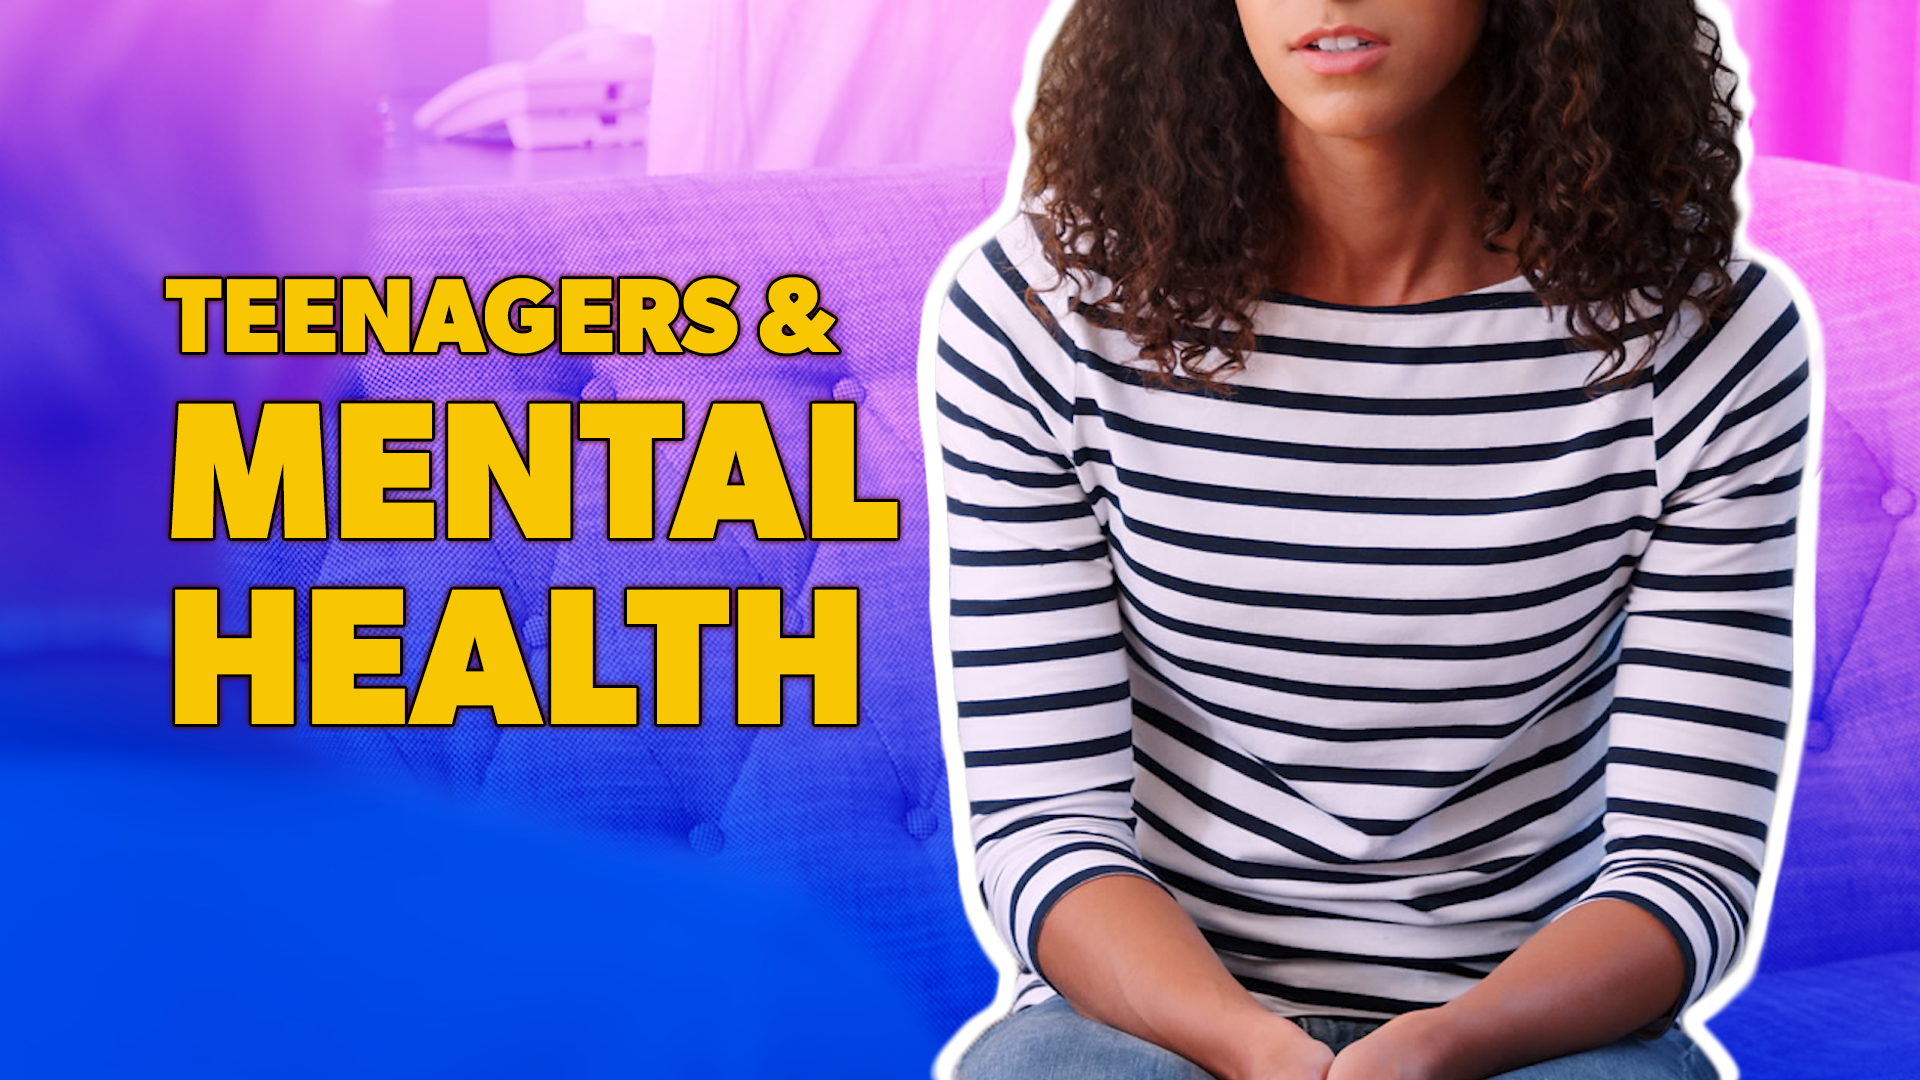 Teens and Mental Health Hero